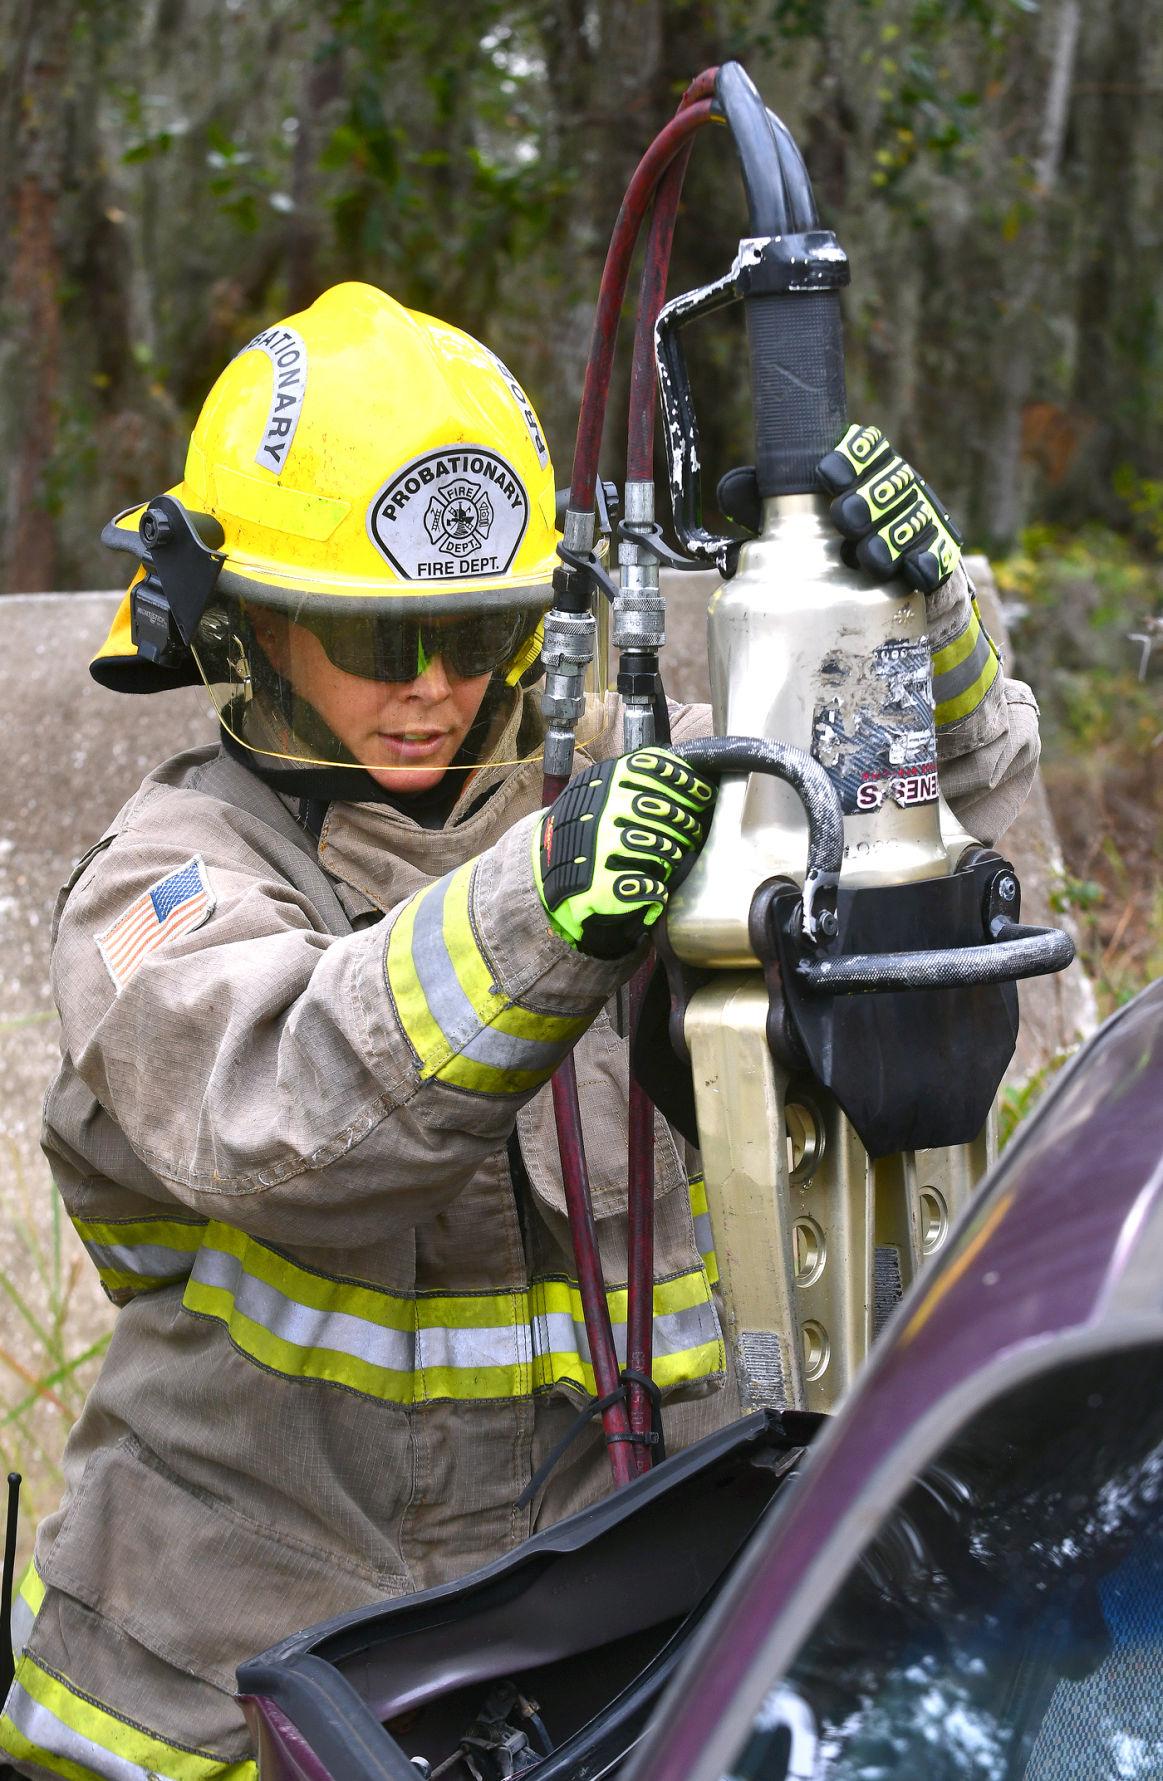 marine corp firefighter